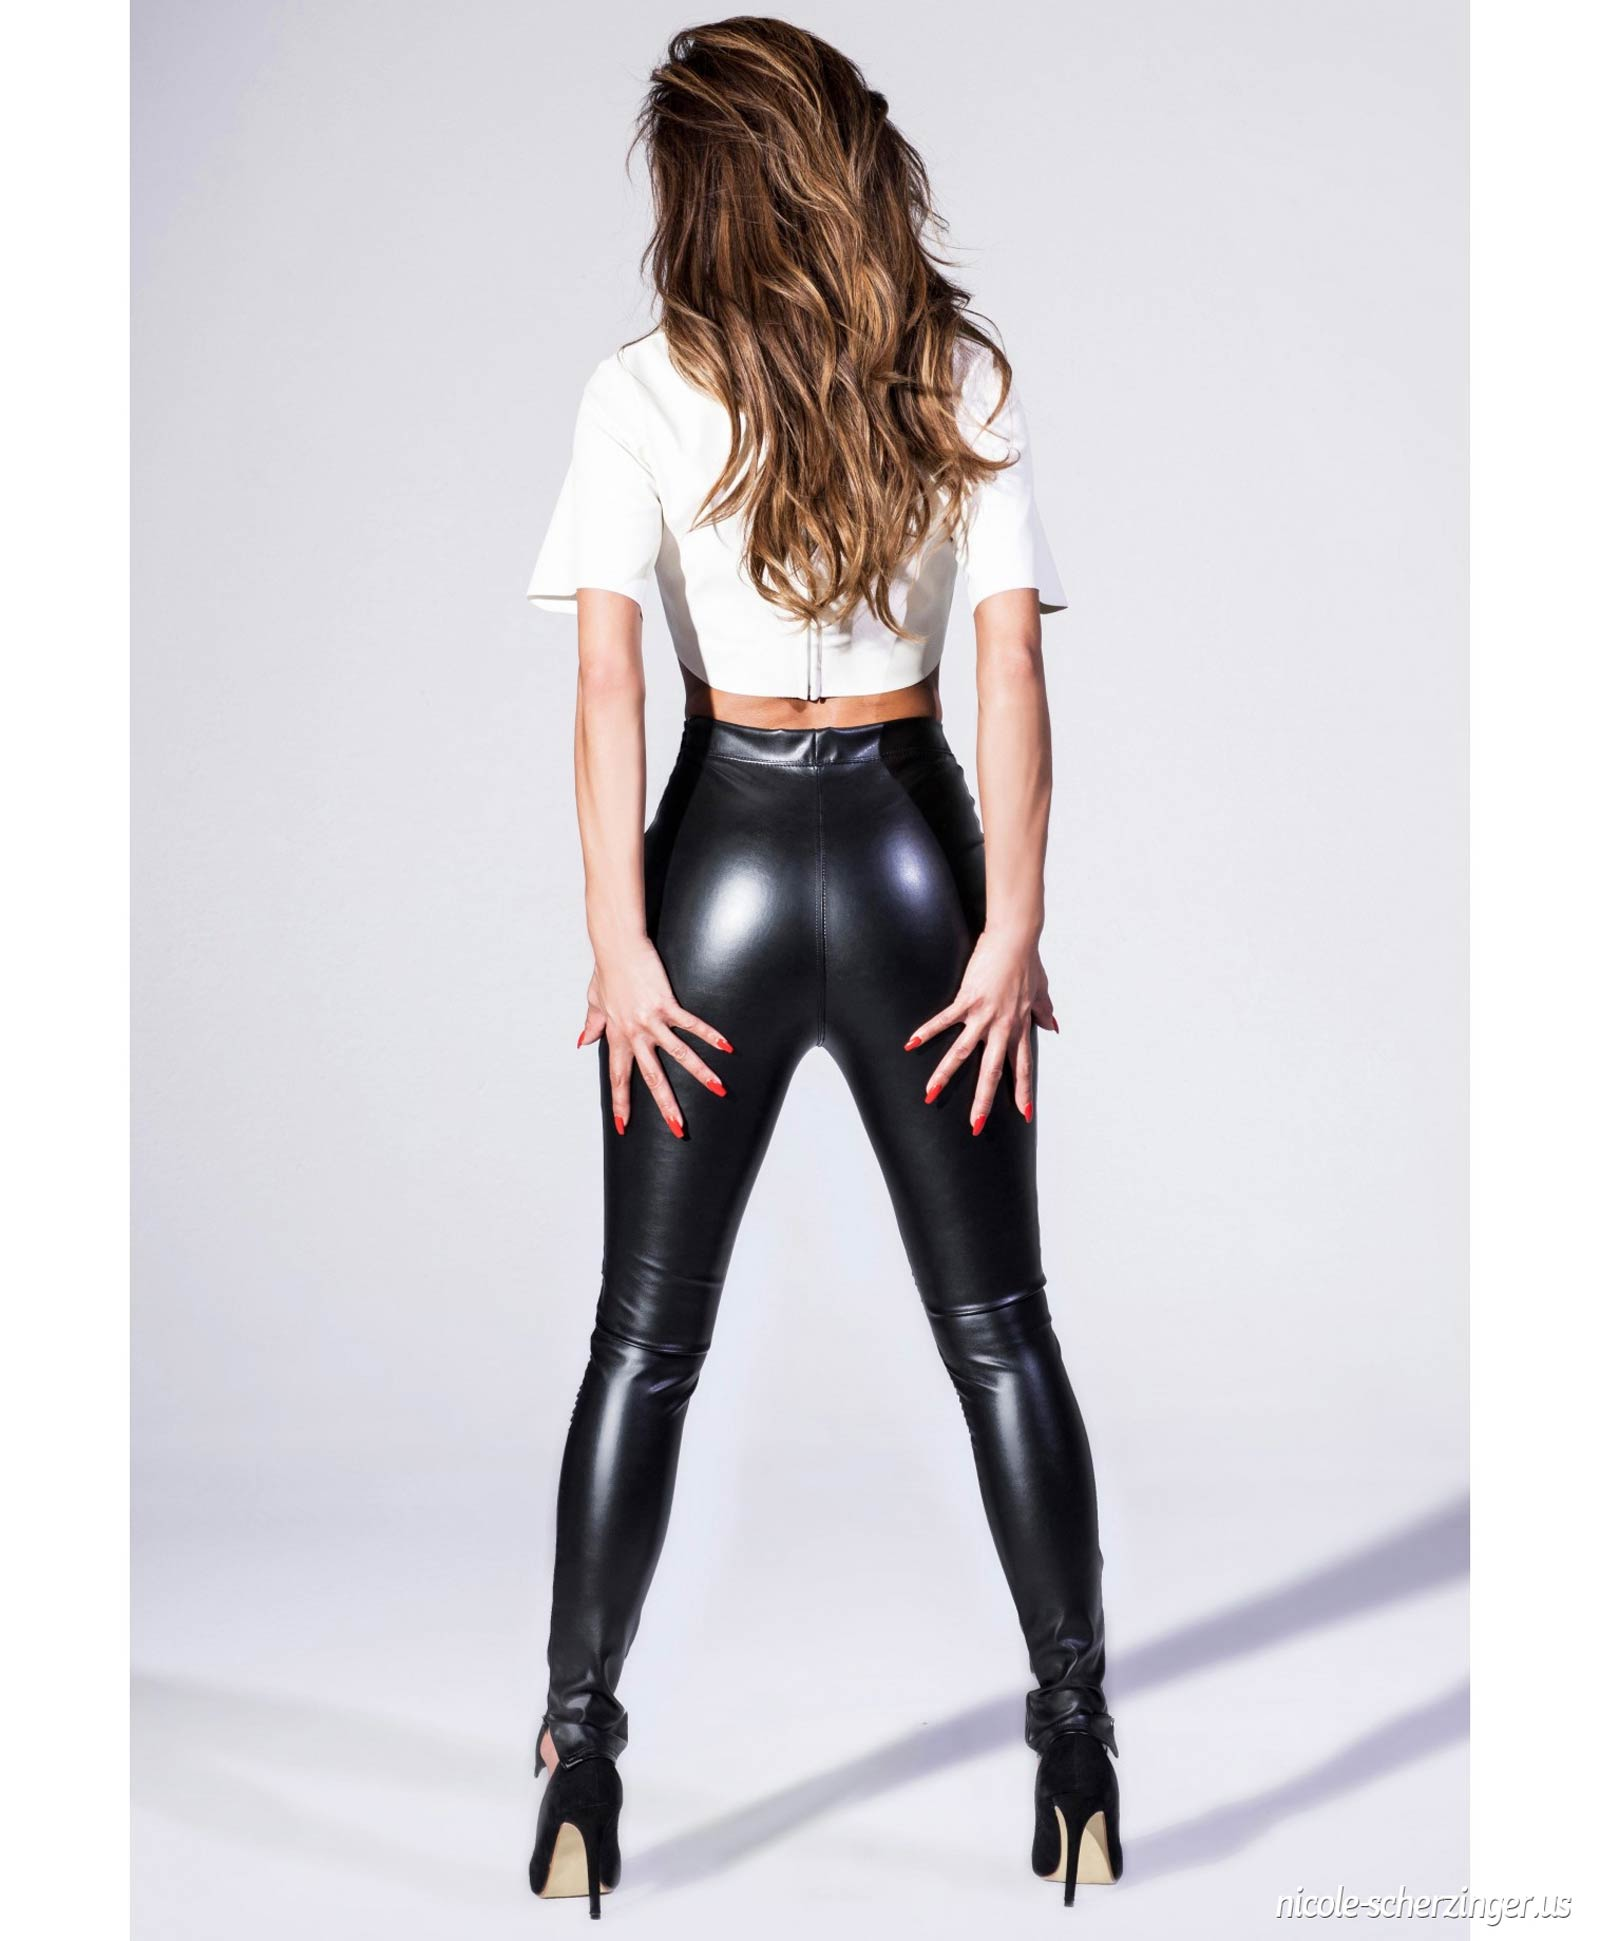 Nicole Scherzinger photoshoot for Nicole x Missguided Collection